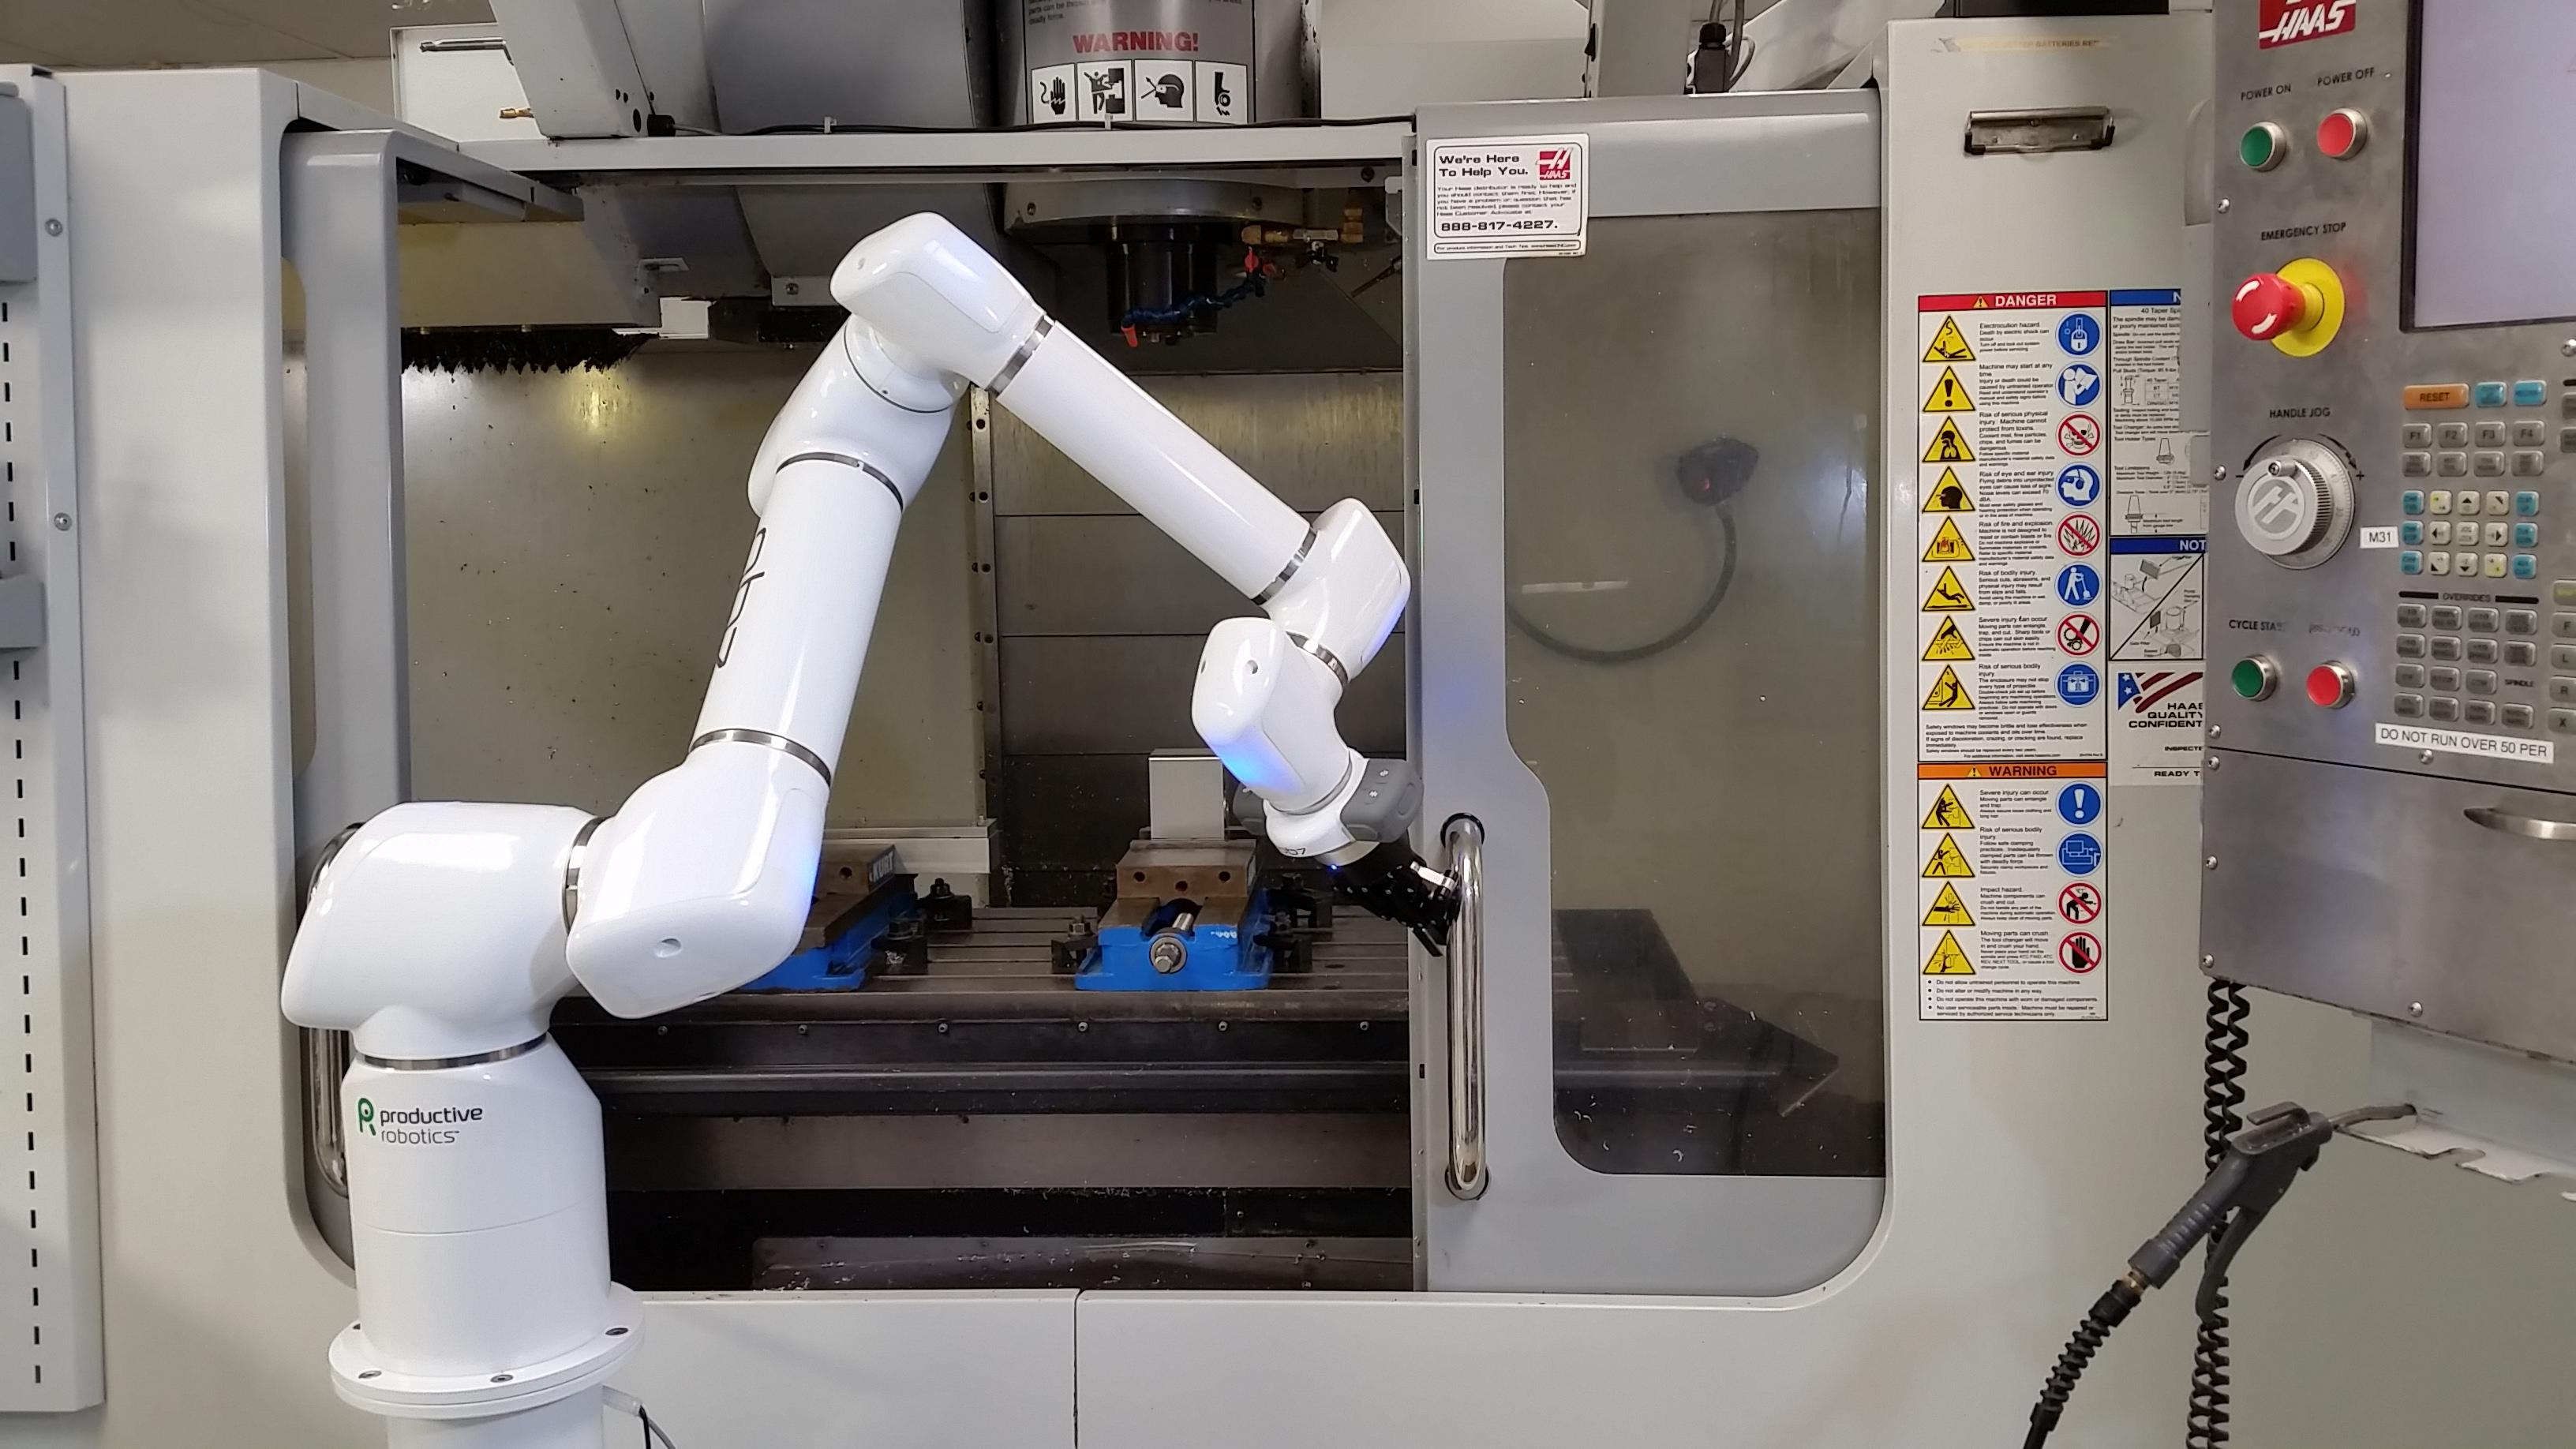 What Makes Smart Robots Smart?